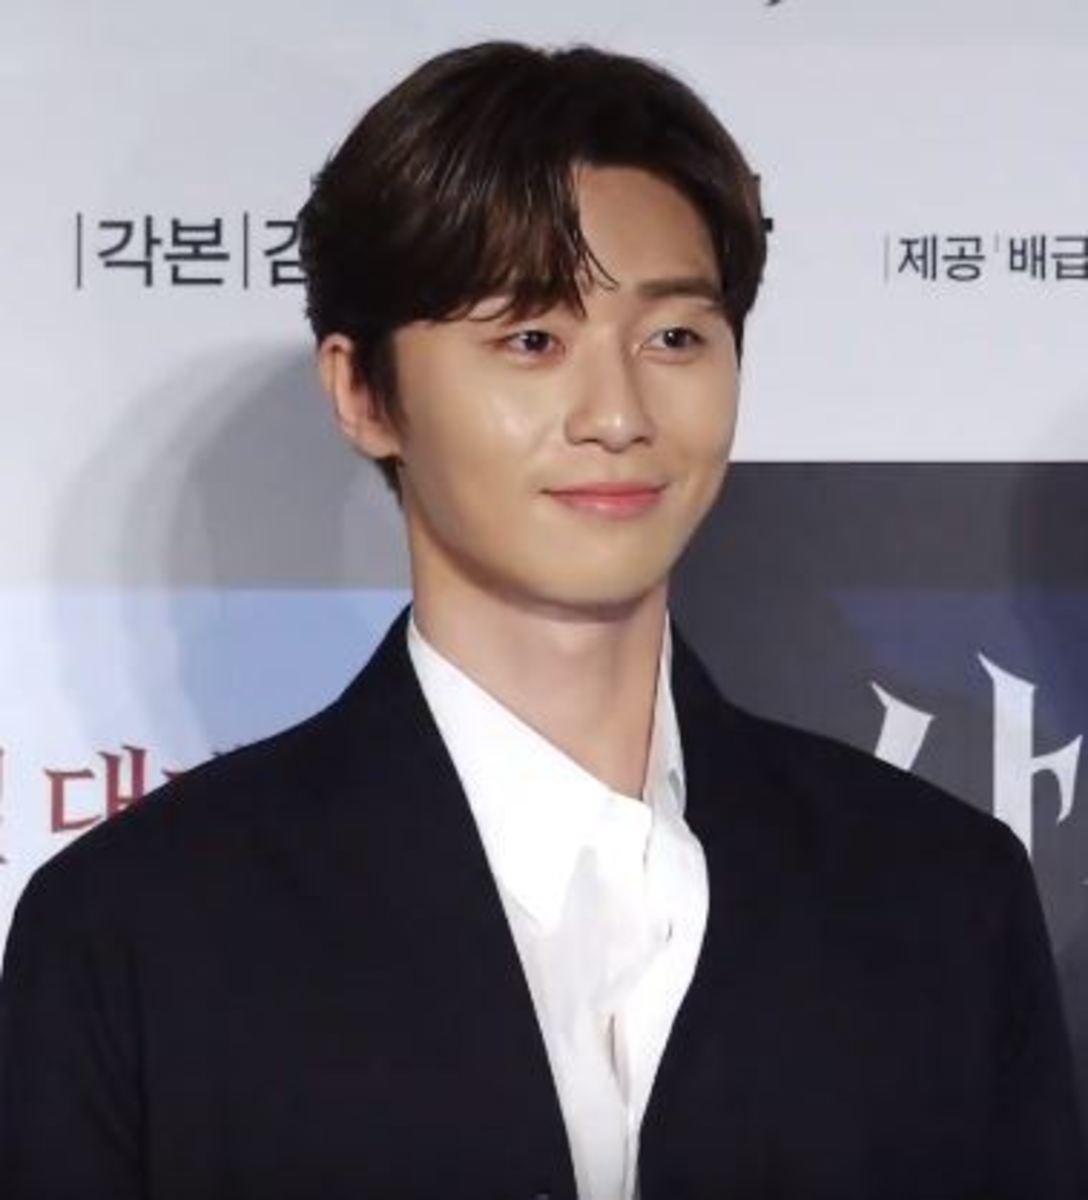 Top 5 Park Seo Joon Dramas (Ranked)